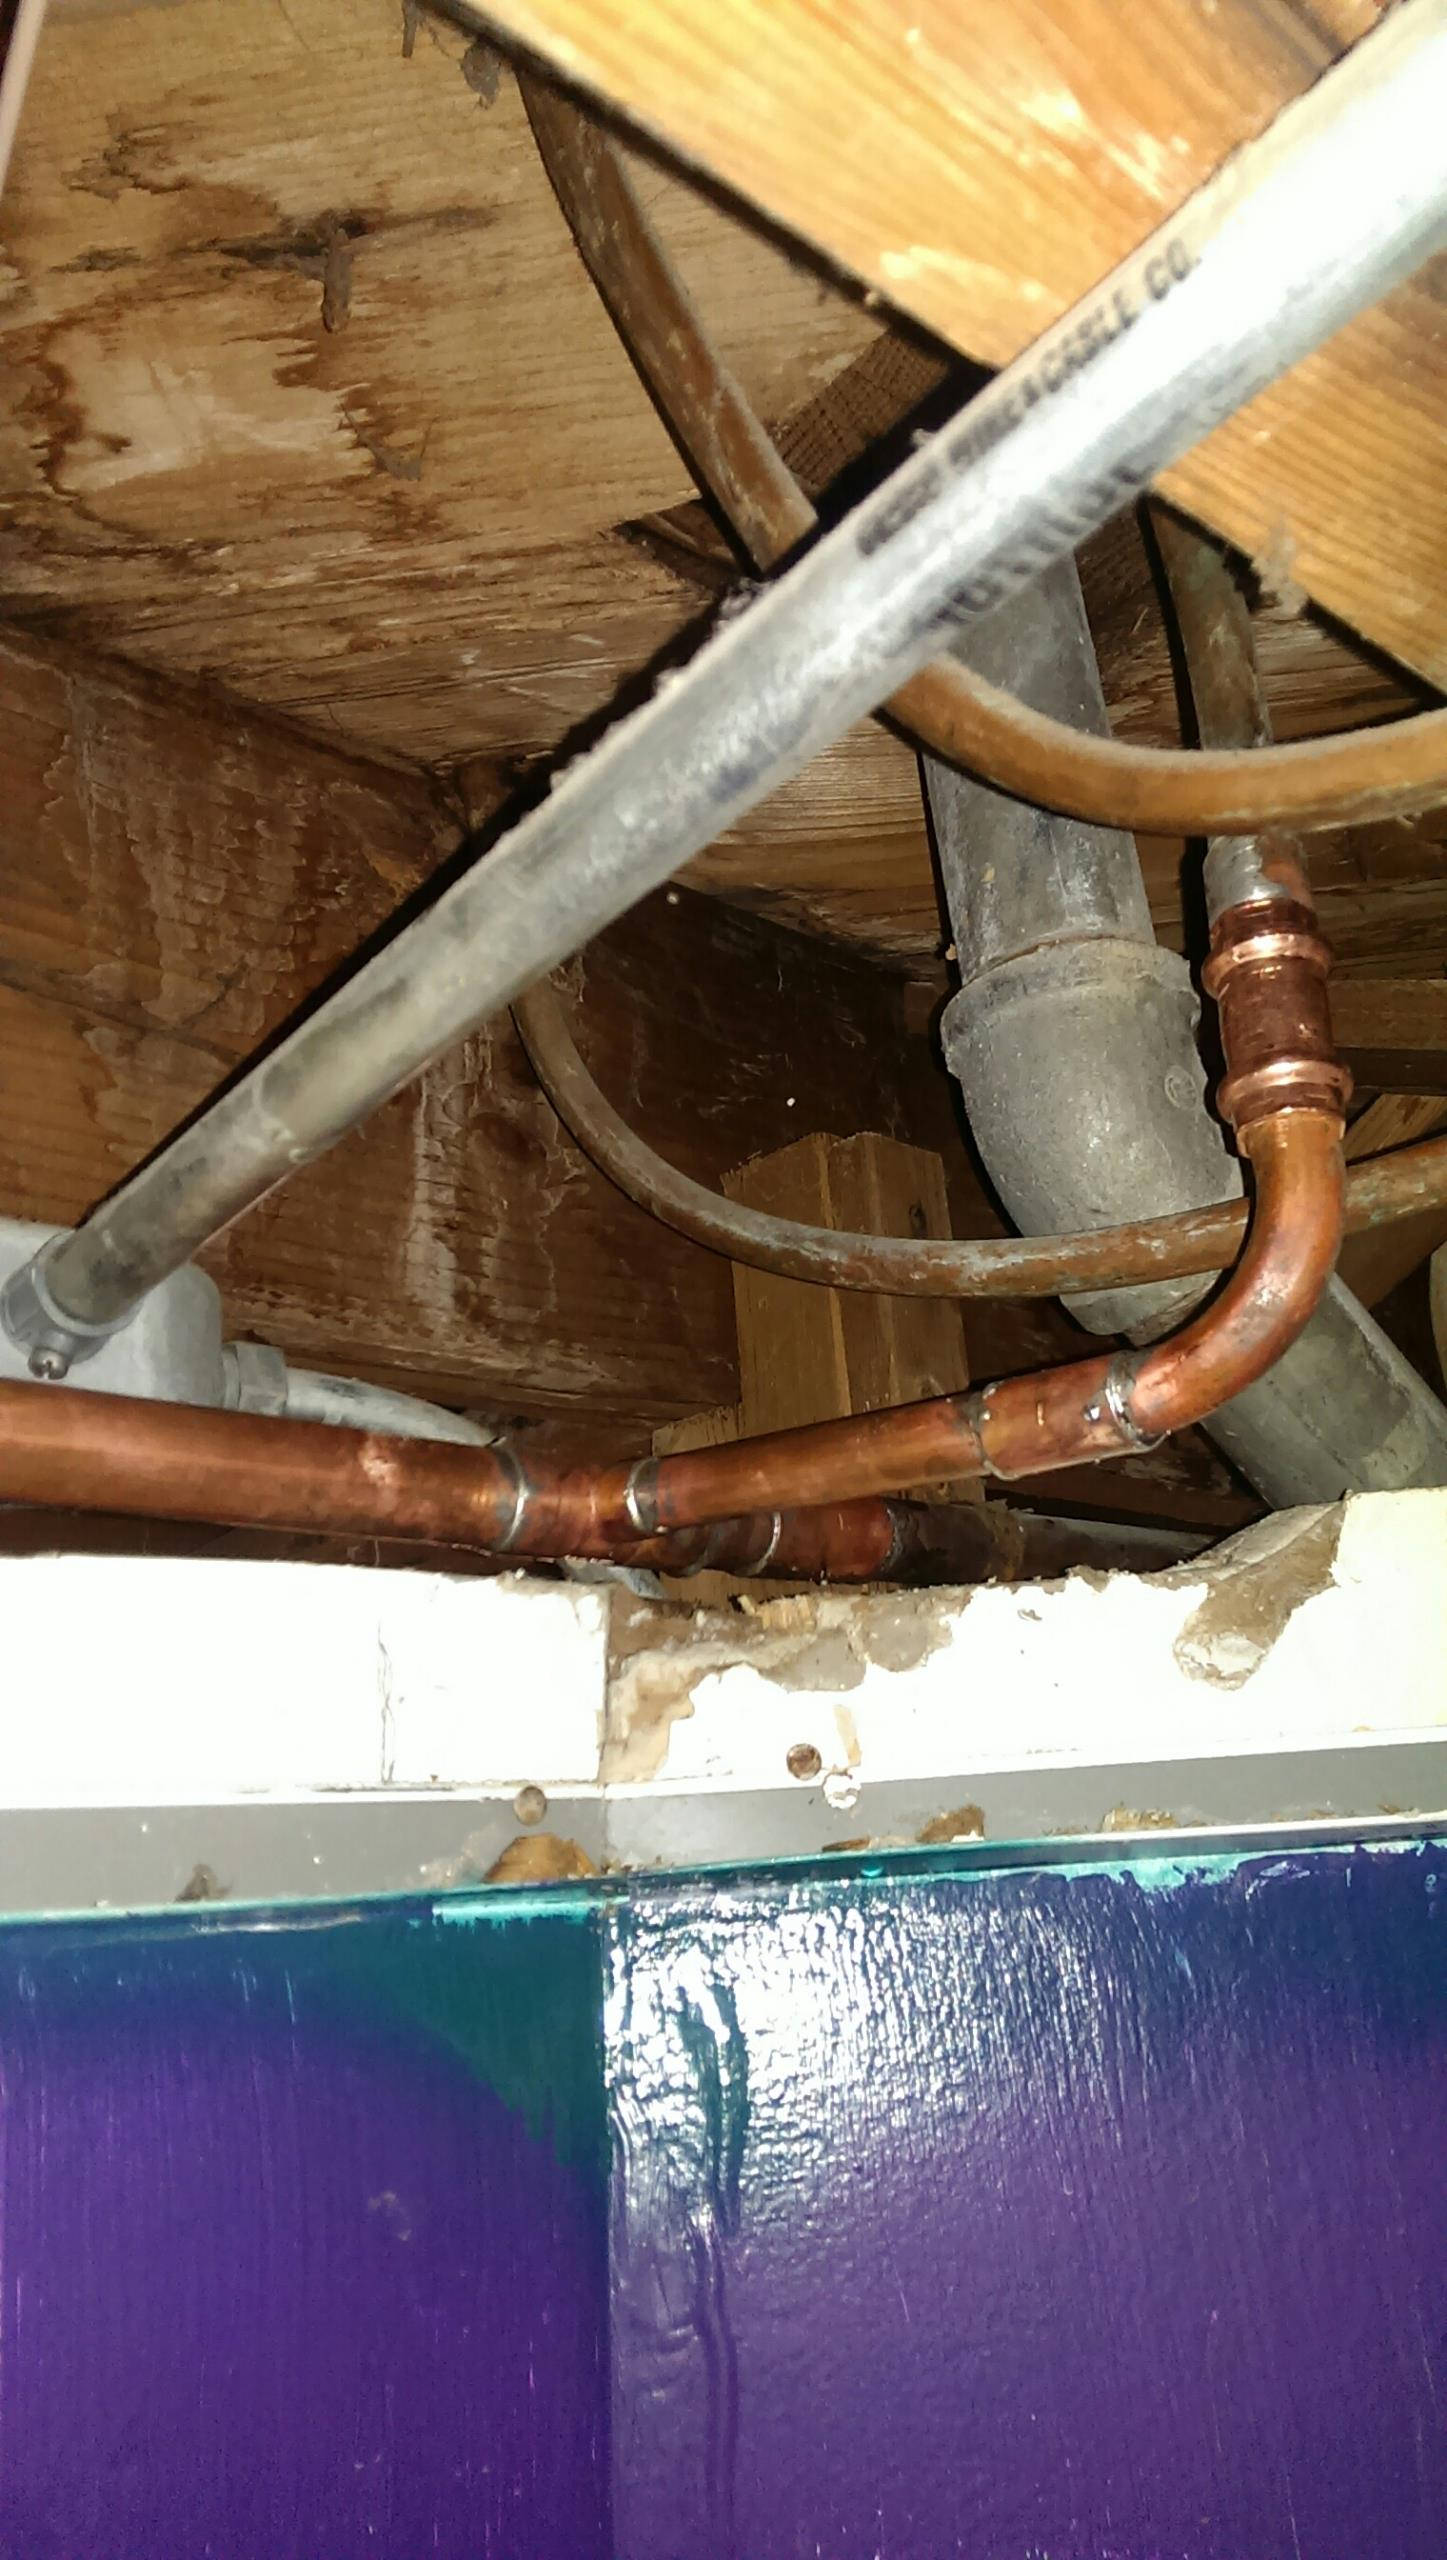 Mounds View, MN - Water pipe repair. Leaking pipe. Saturday plumbing service.